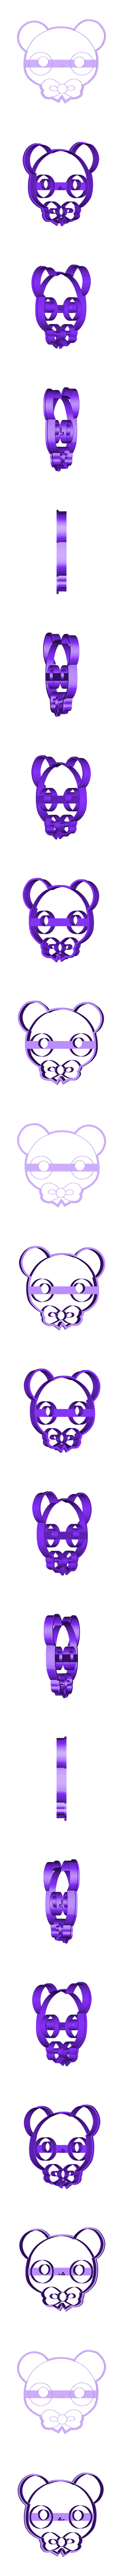 Cute Bear CookieCutter by FewDey.stl Download STL file Cute Bear COOKIE CUTTER • 3D printable design, FewDey